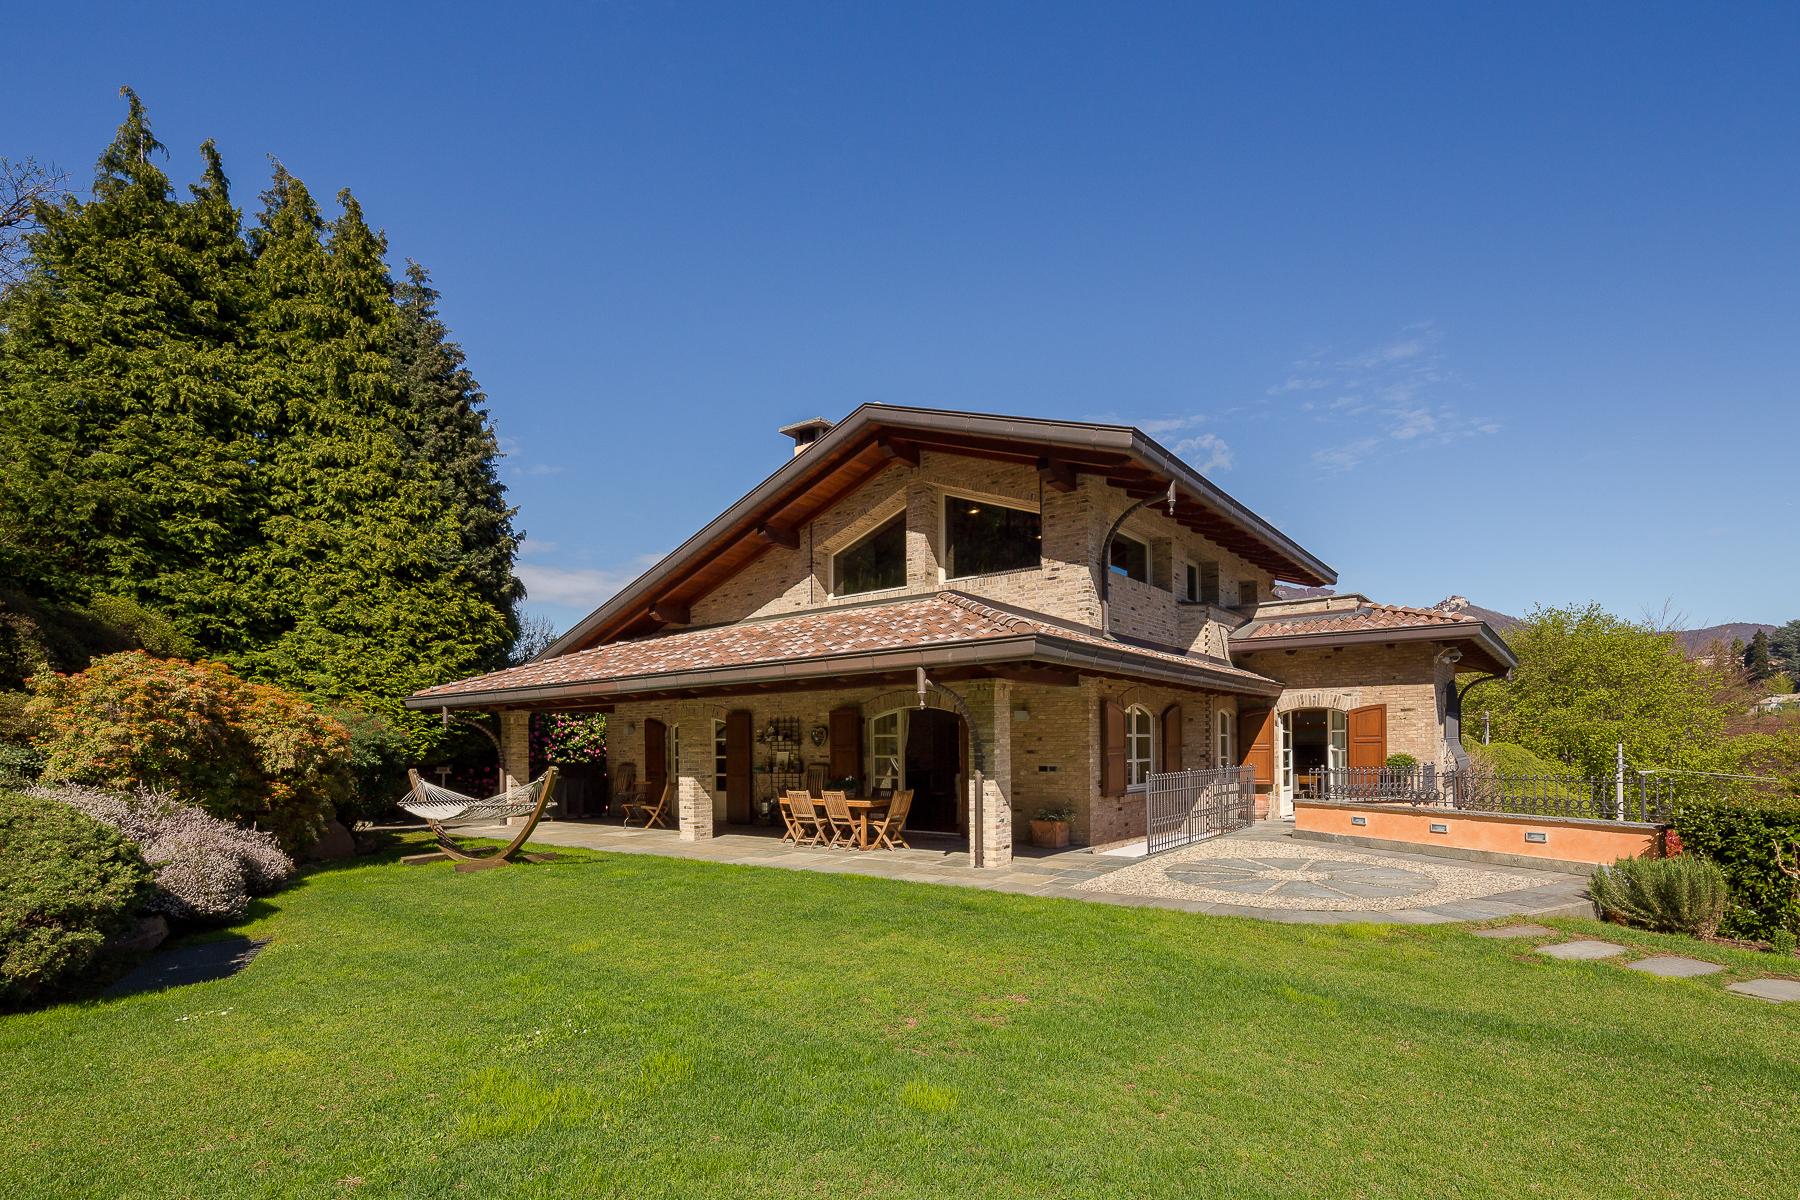 Villa in Vendita a Varese: 5 locali, 470 mq - Foto 3